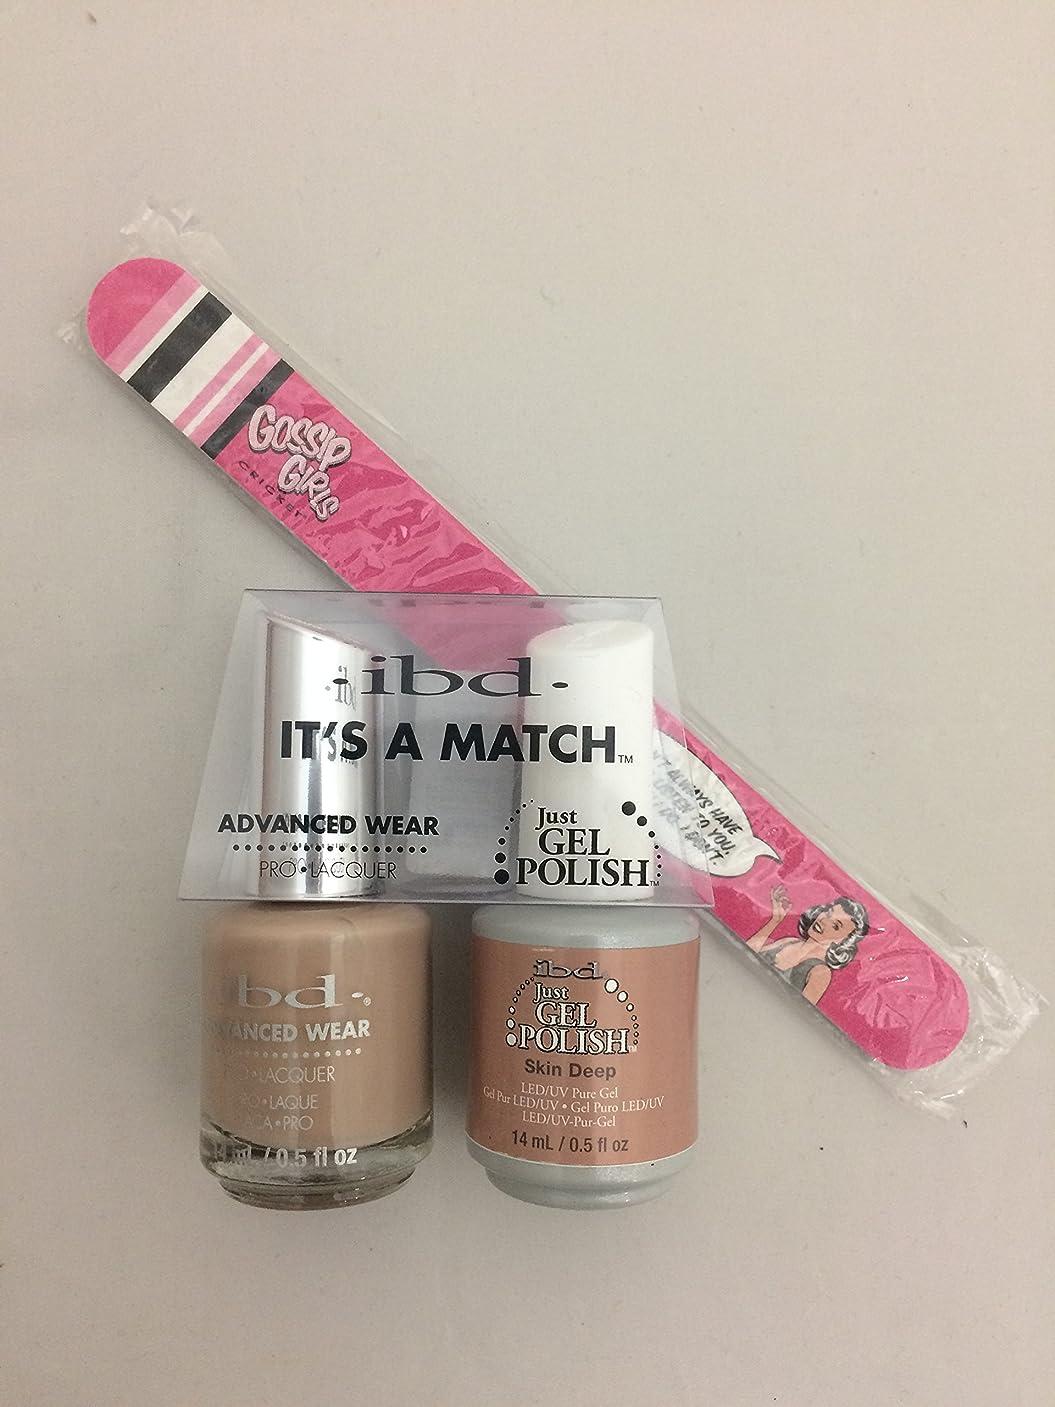 宗教付与酸ibd - It's A Match -Duo Pack- Nude Collection - Skin Deep - 14 mL / 0.5 oz Each